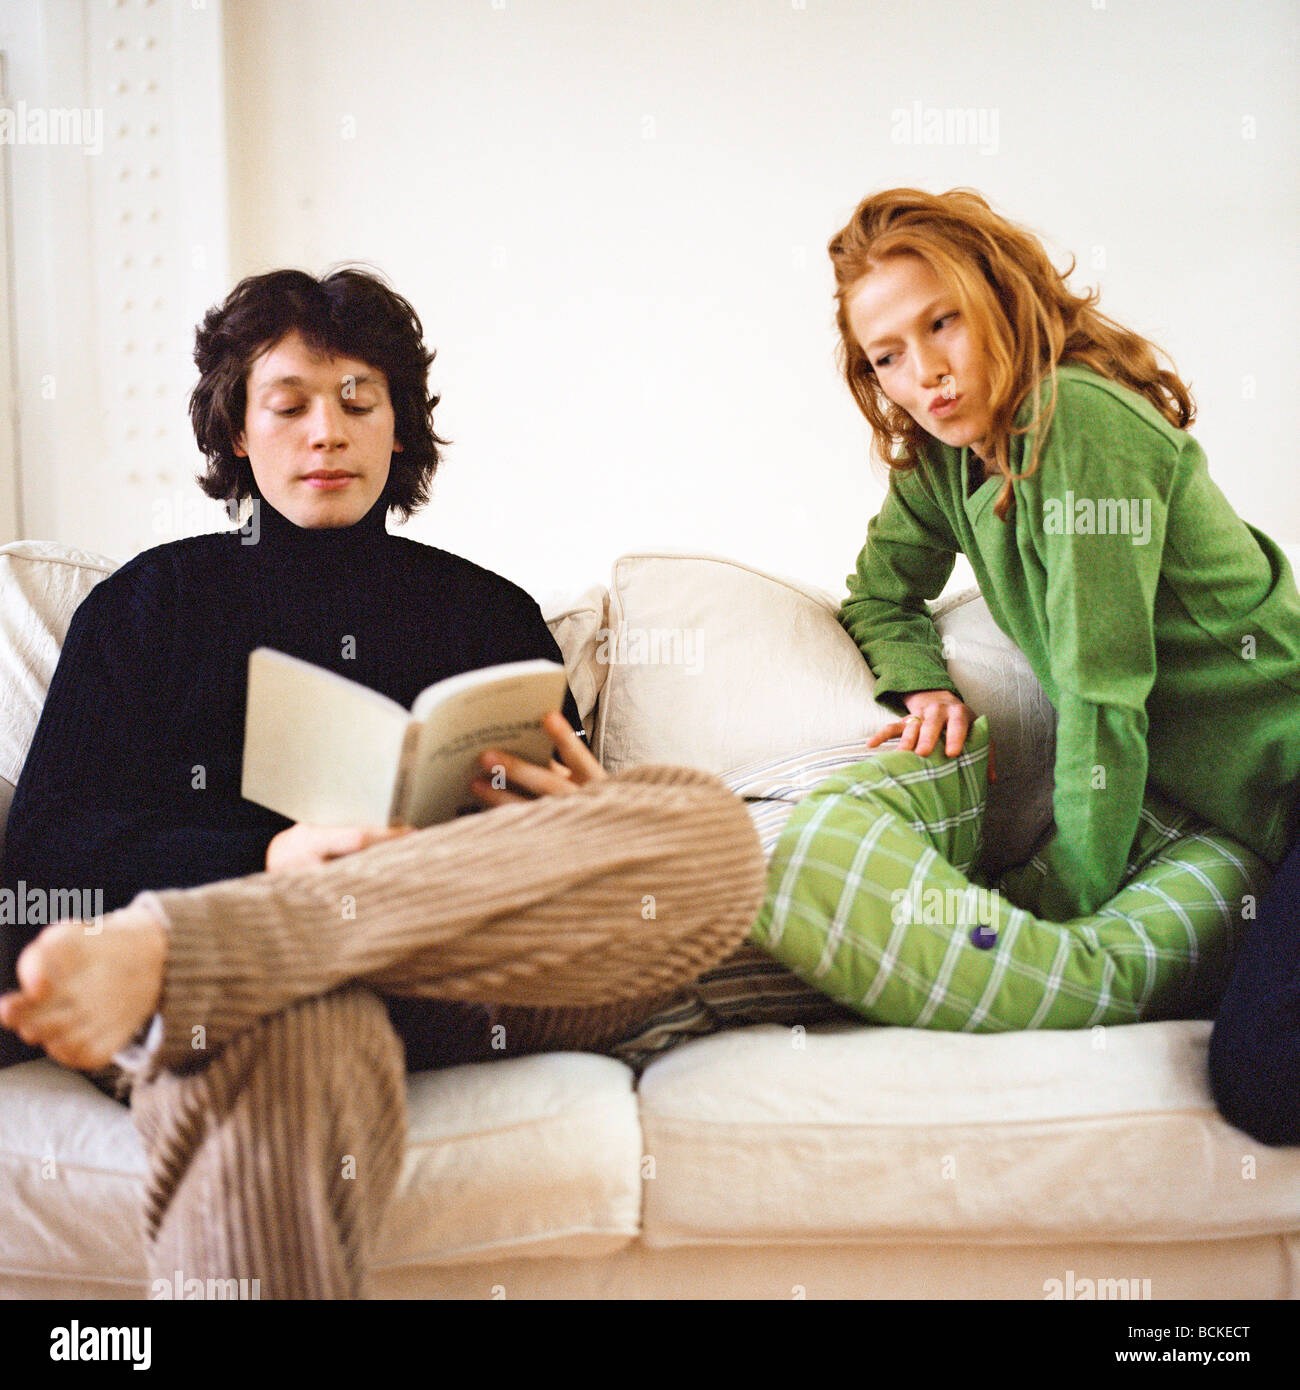 Couple on sofa - Stock Image